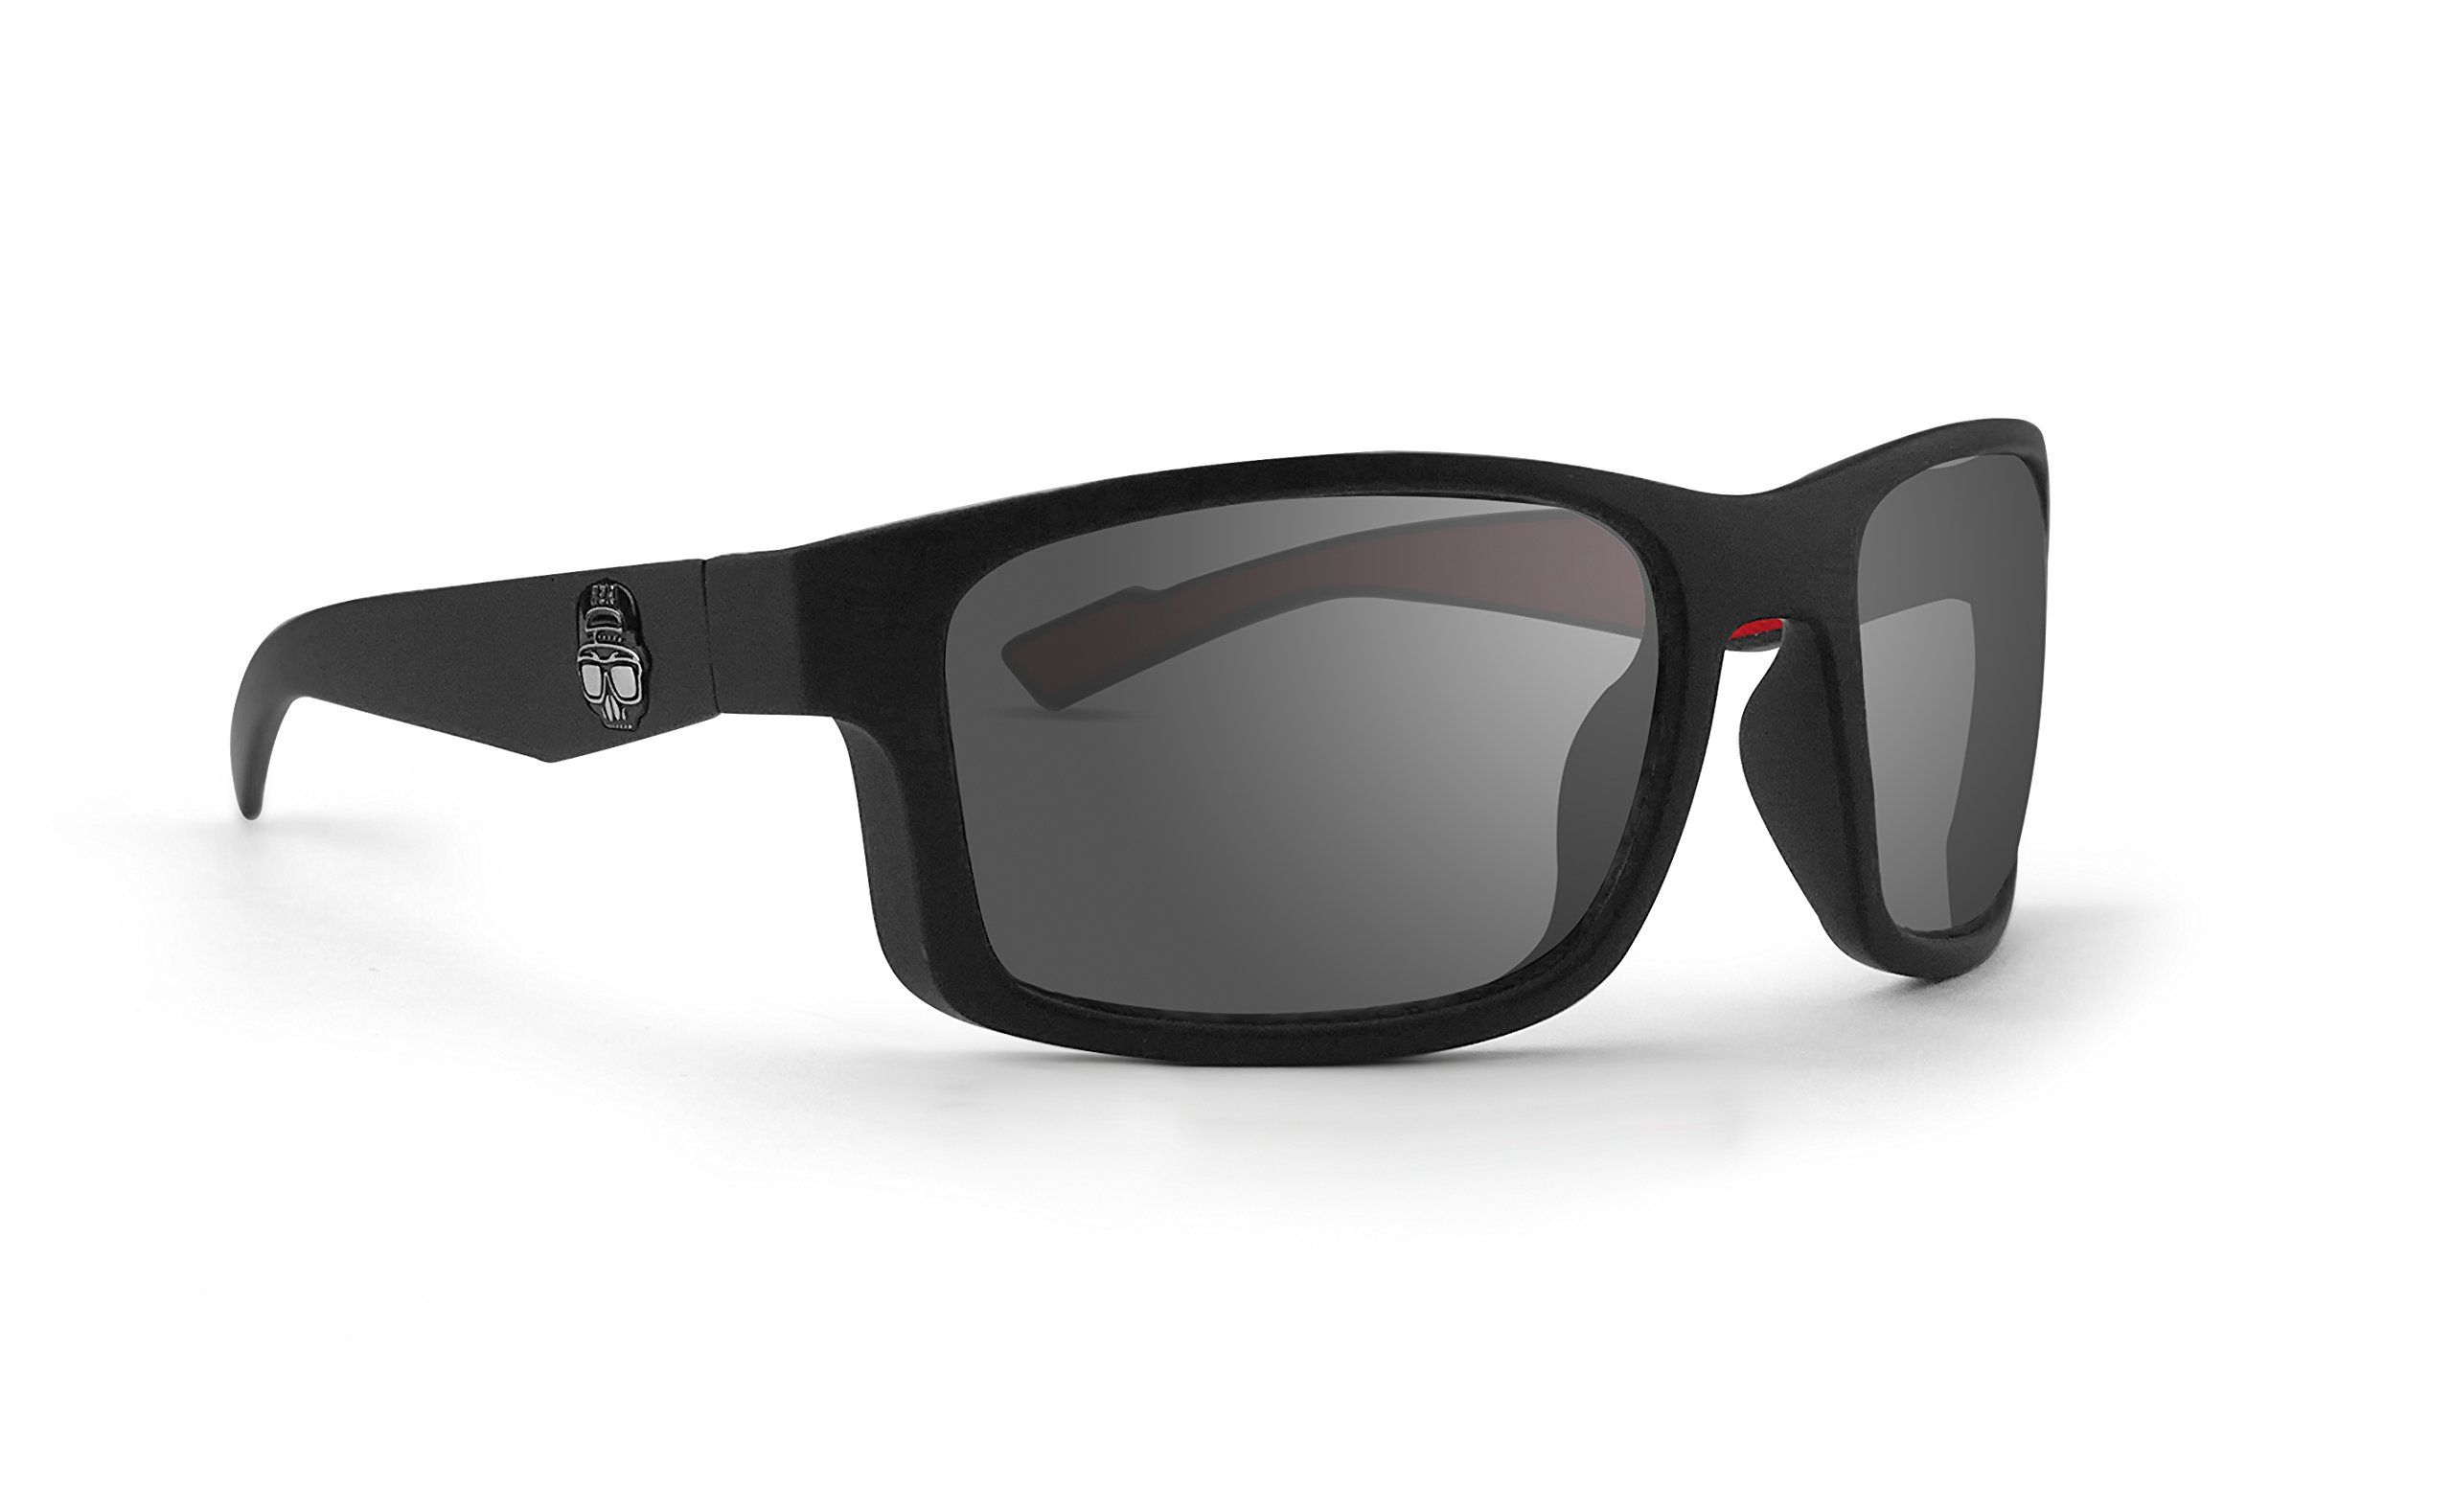 Epoch Adam Sandoval Rides Magnet Performance Glasses Black Frame Smoke Lens